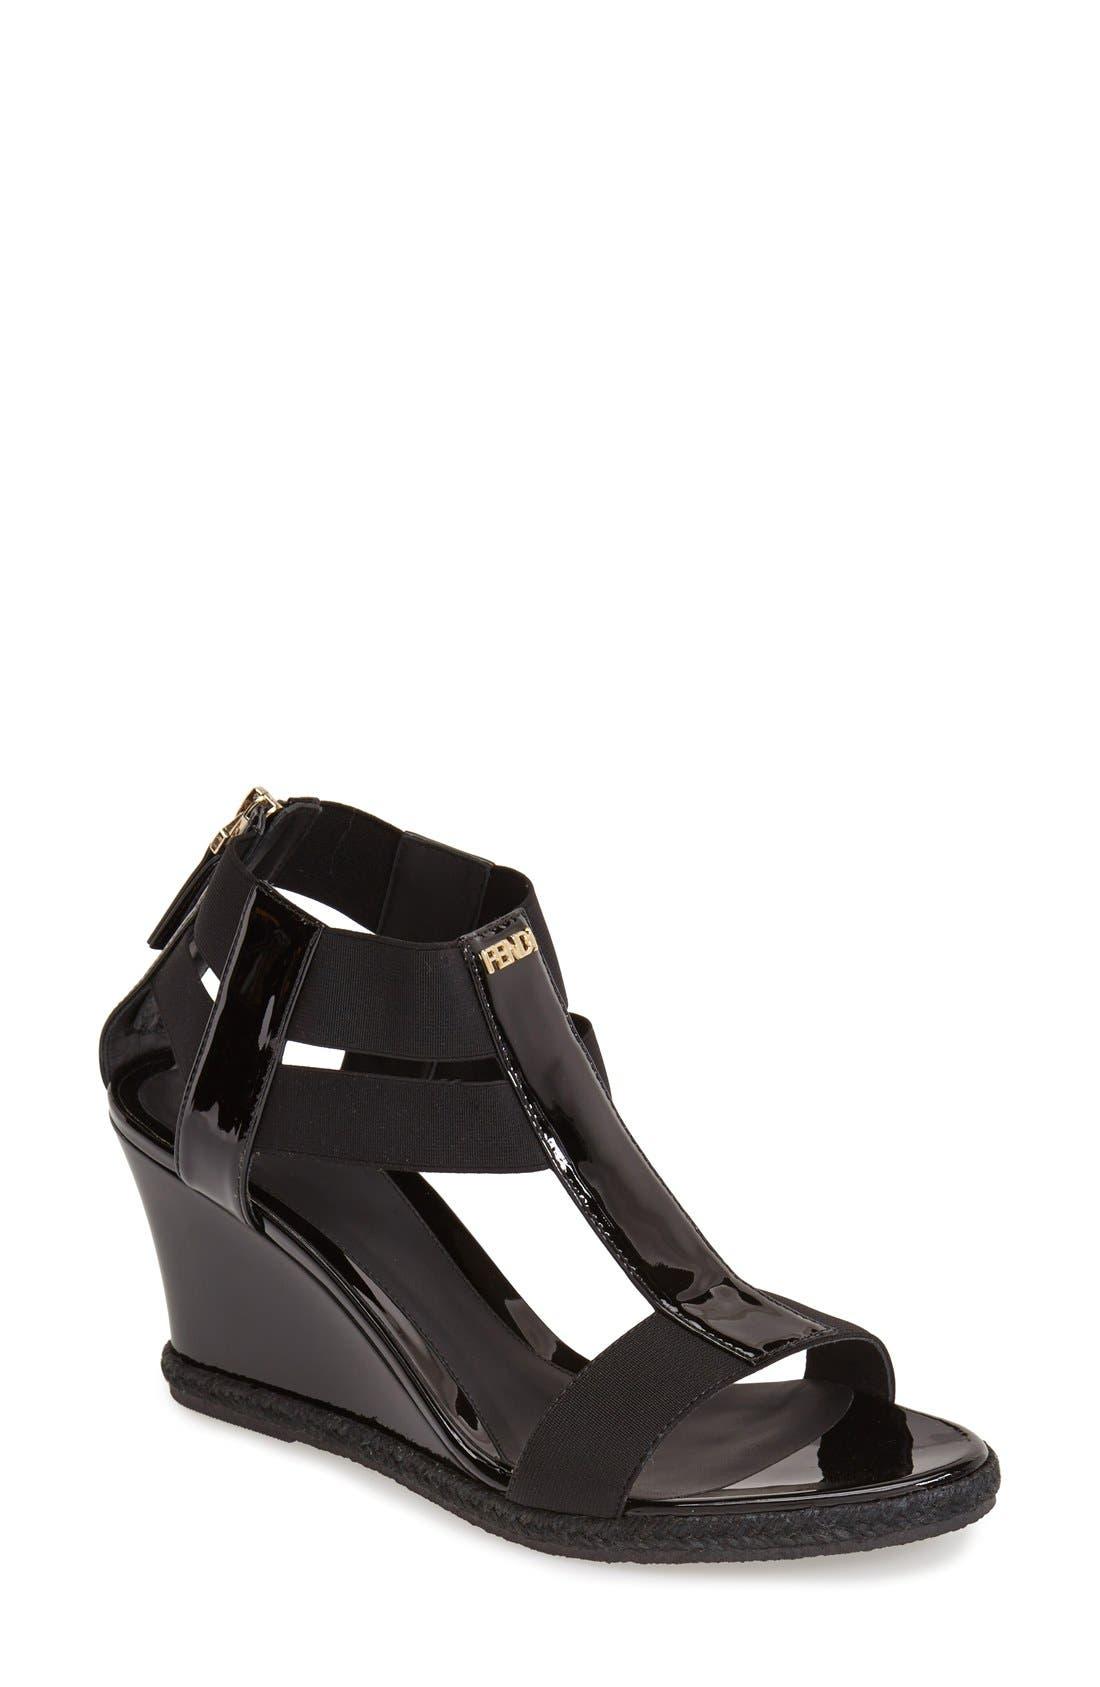 Main Image - Fendi 'Carioca' Wedge Sandal (Women)